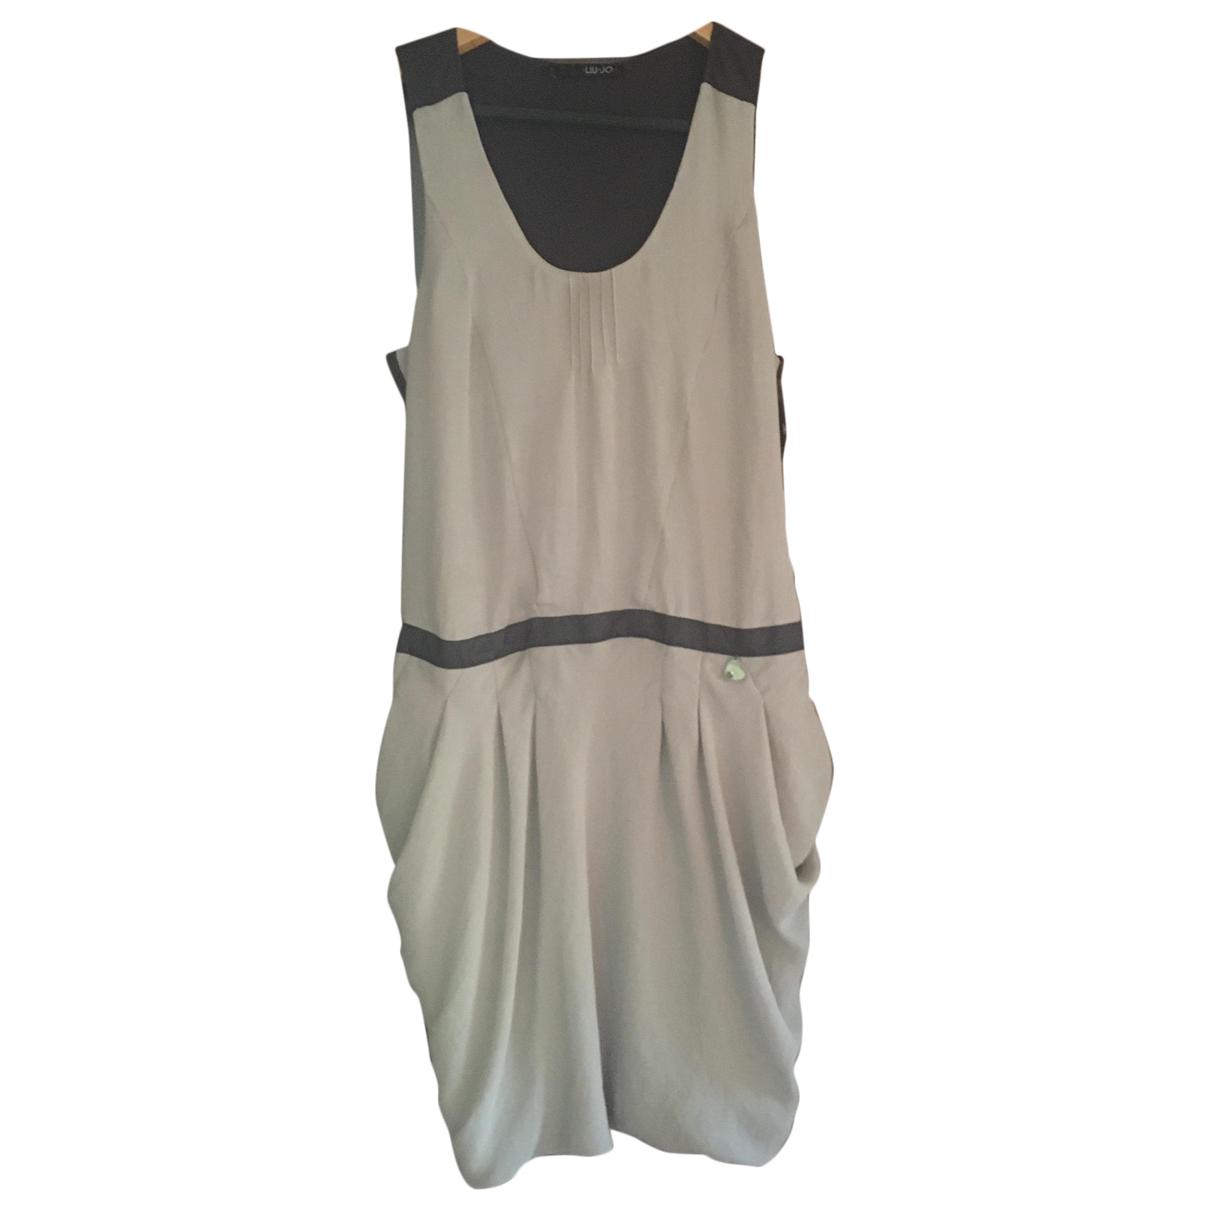 Liu.jo \N Kleid in  Ecru Polyester